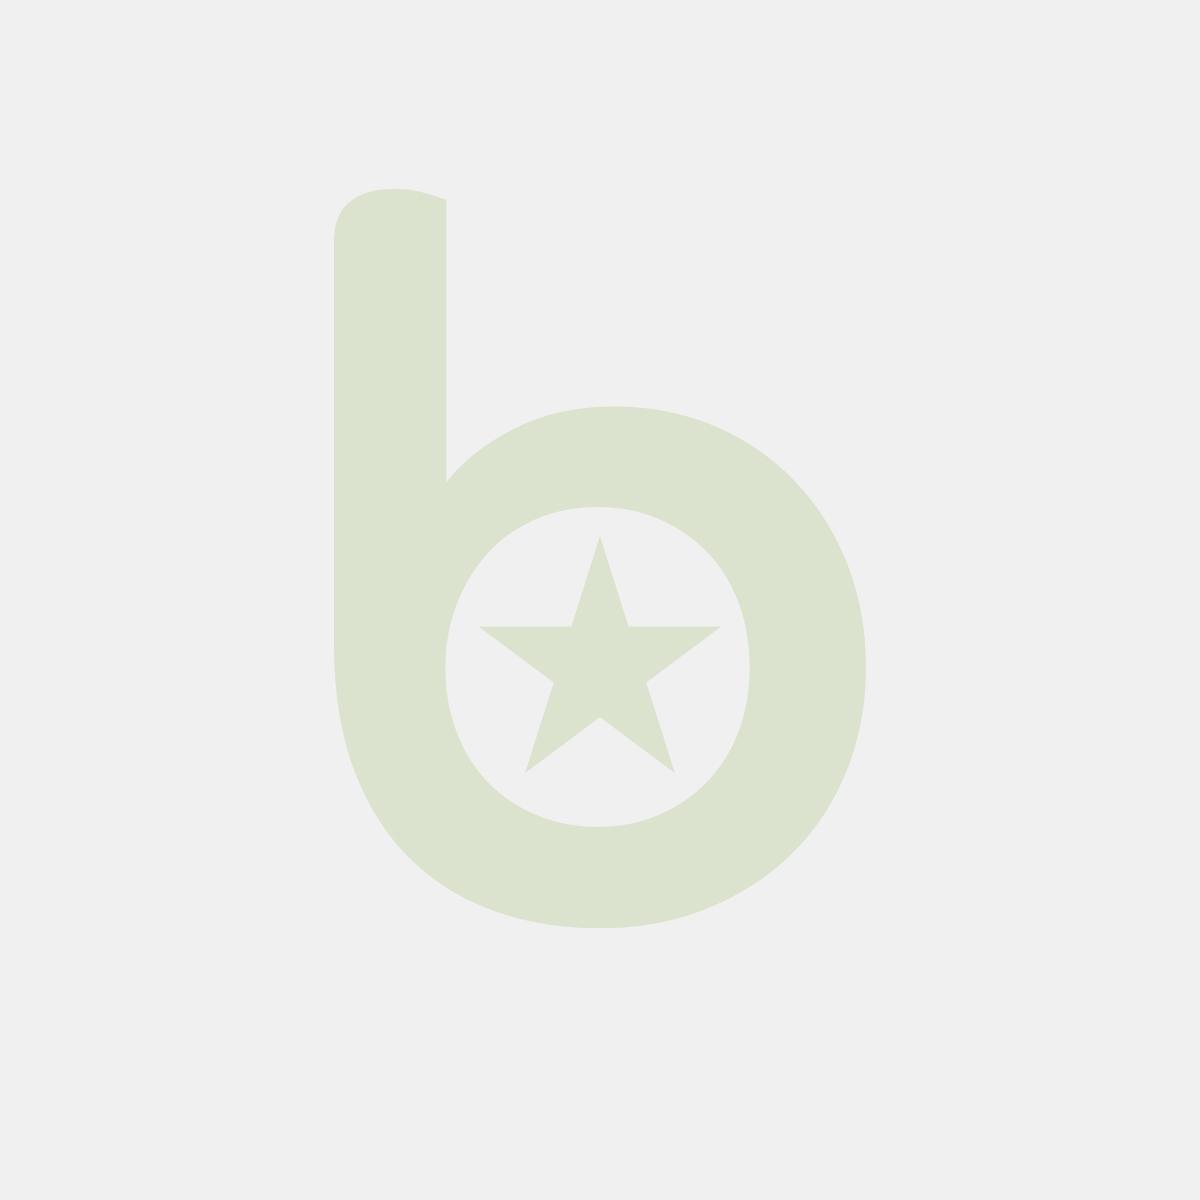 PRISM Kyocera Toner KM-1525/1530 Bk 11k 100%